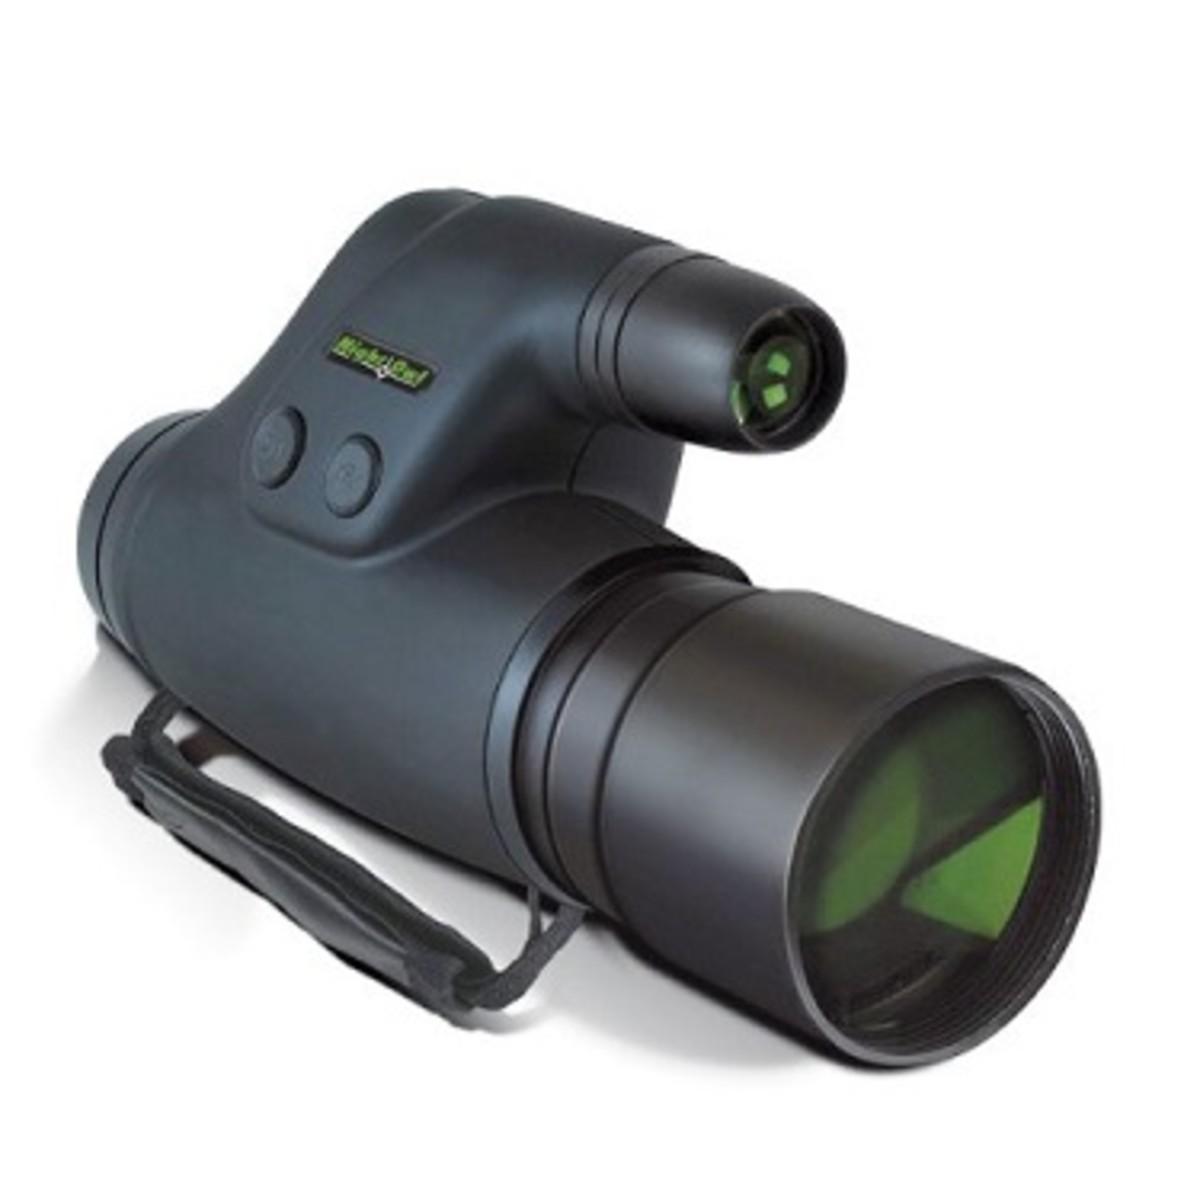 cool spy gadgets amazon